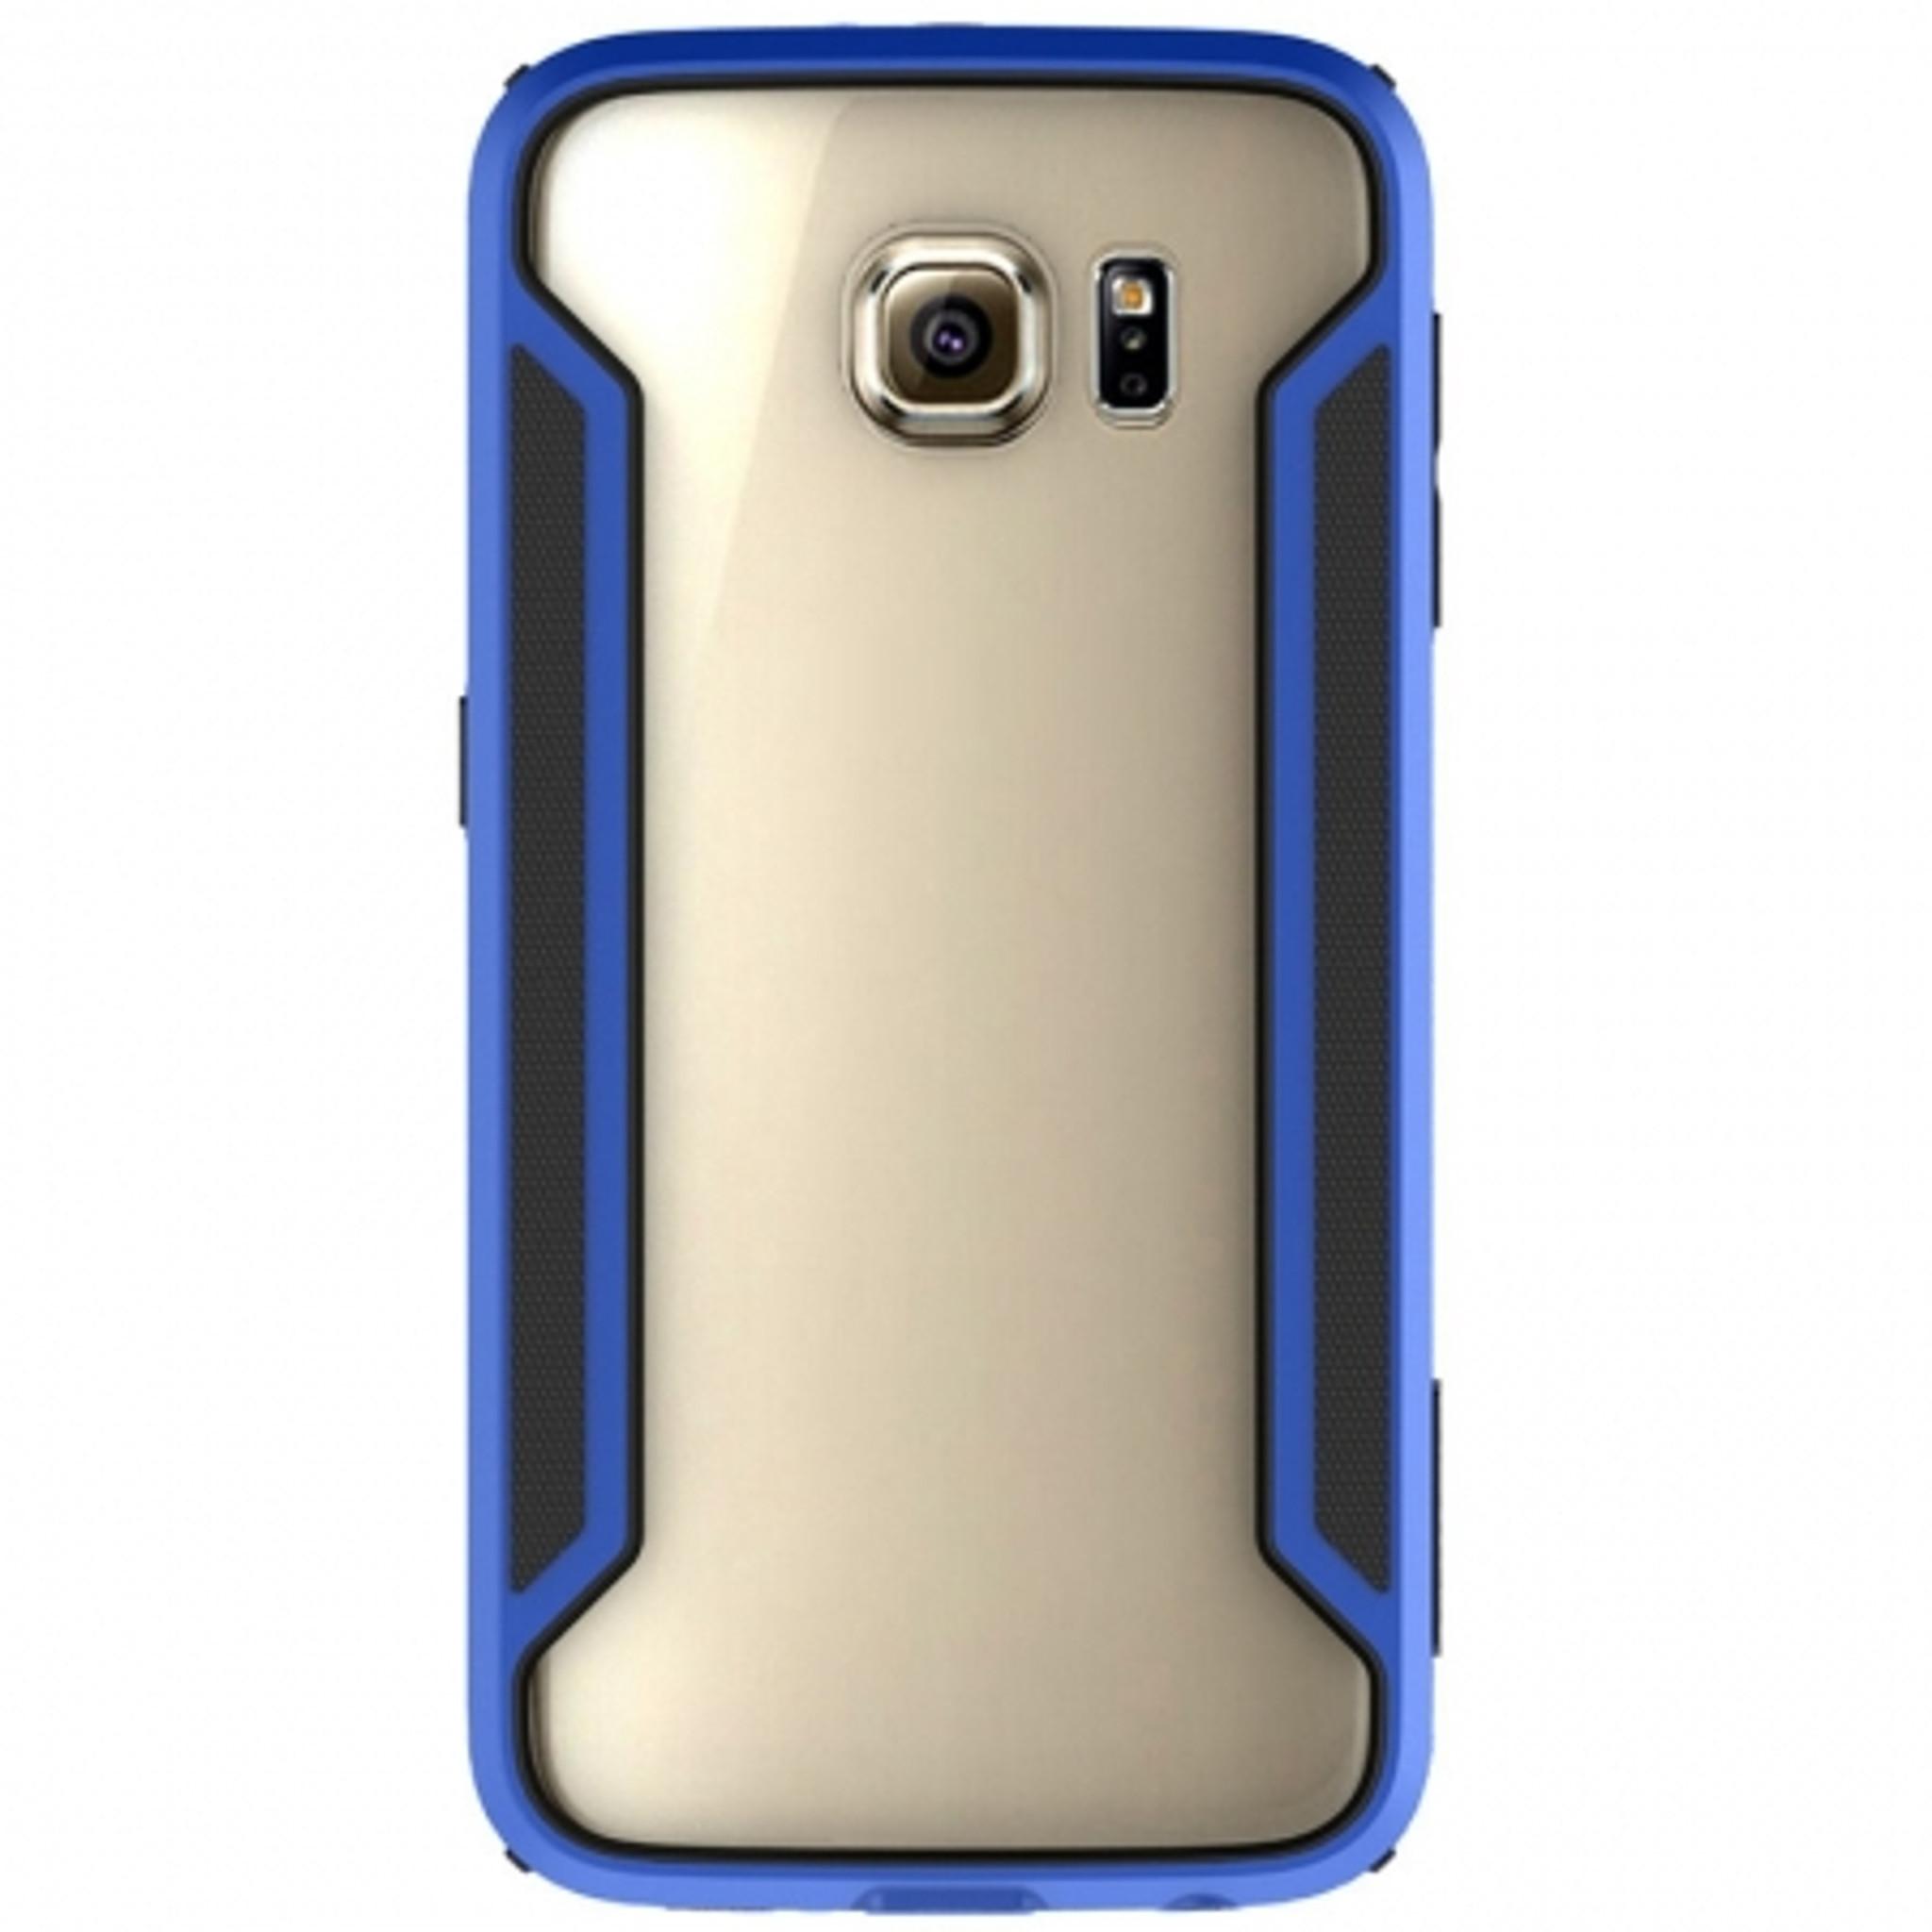 Nillkin Armor Border Case for Galaxy S6 - Blue